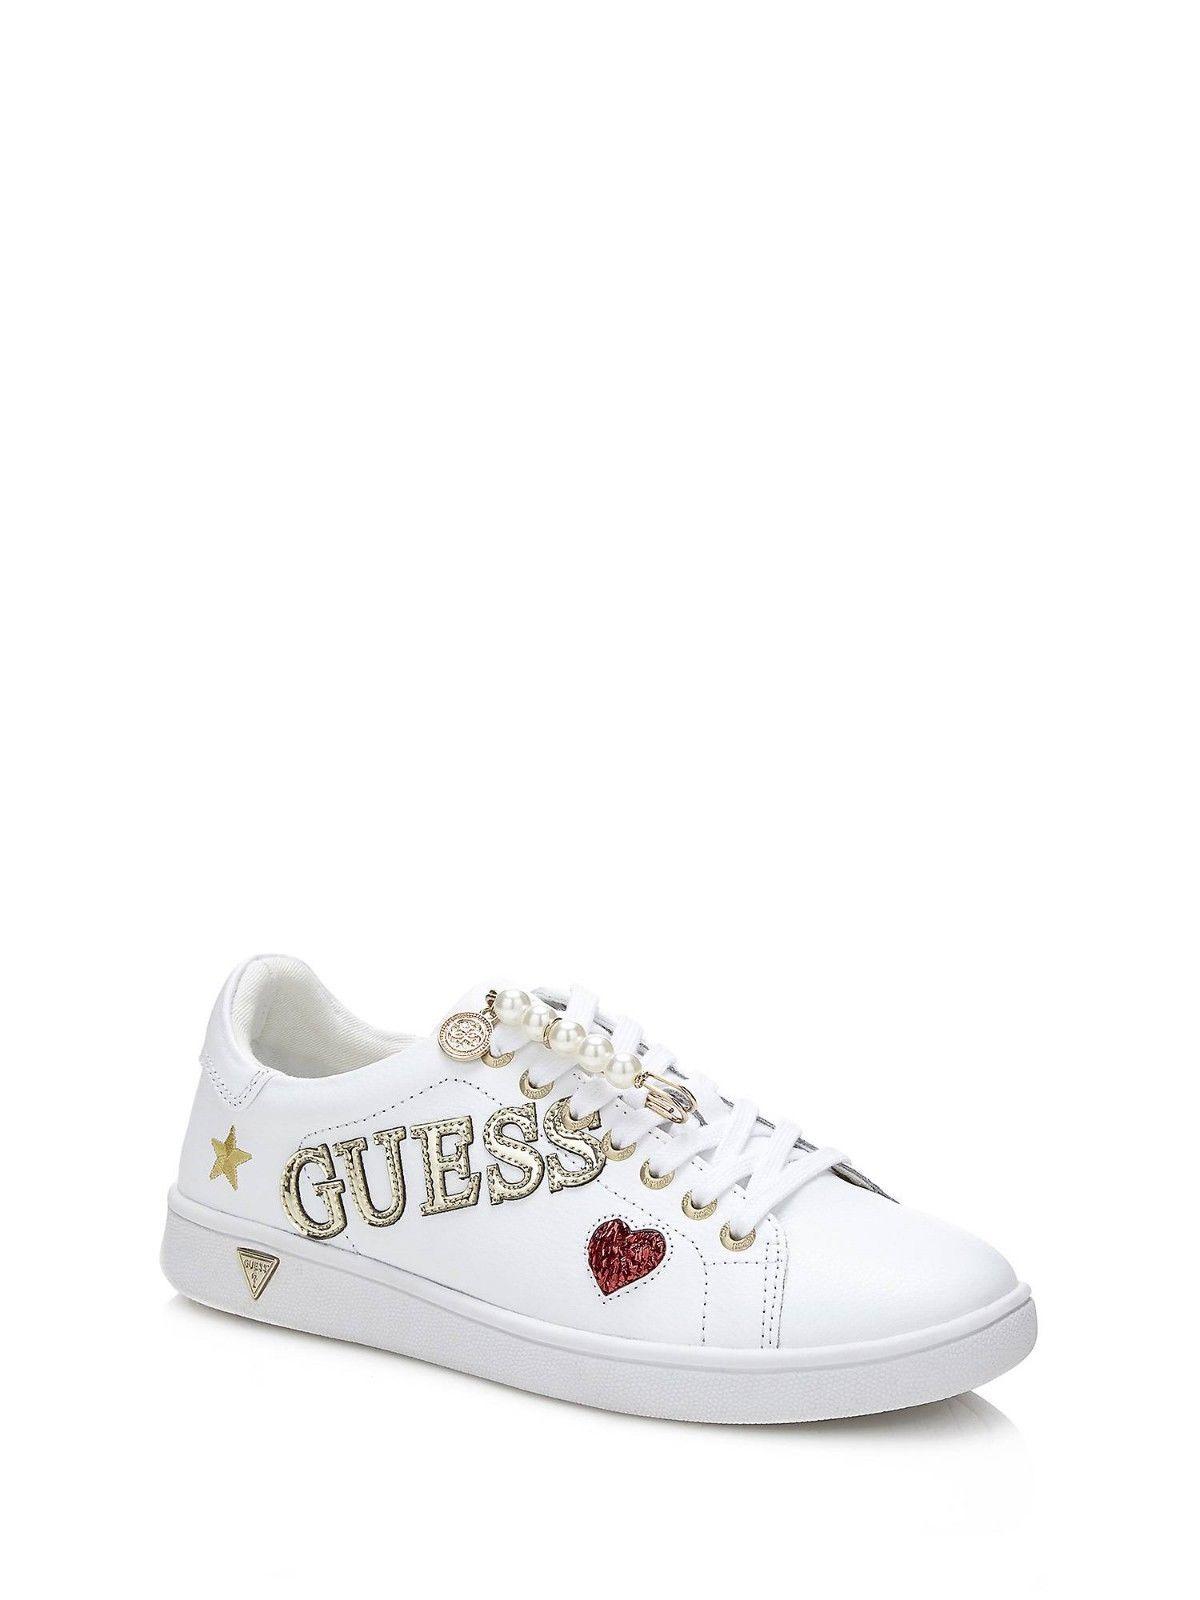 Guess Scarpe / shoes donna originali